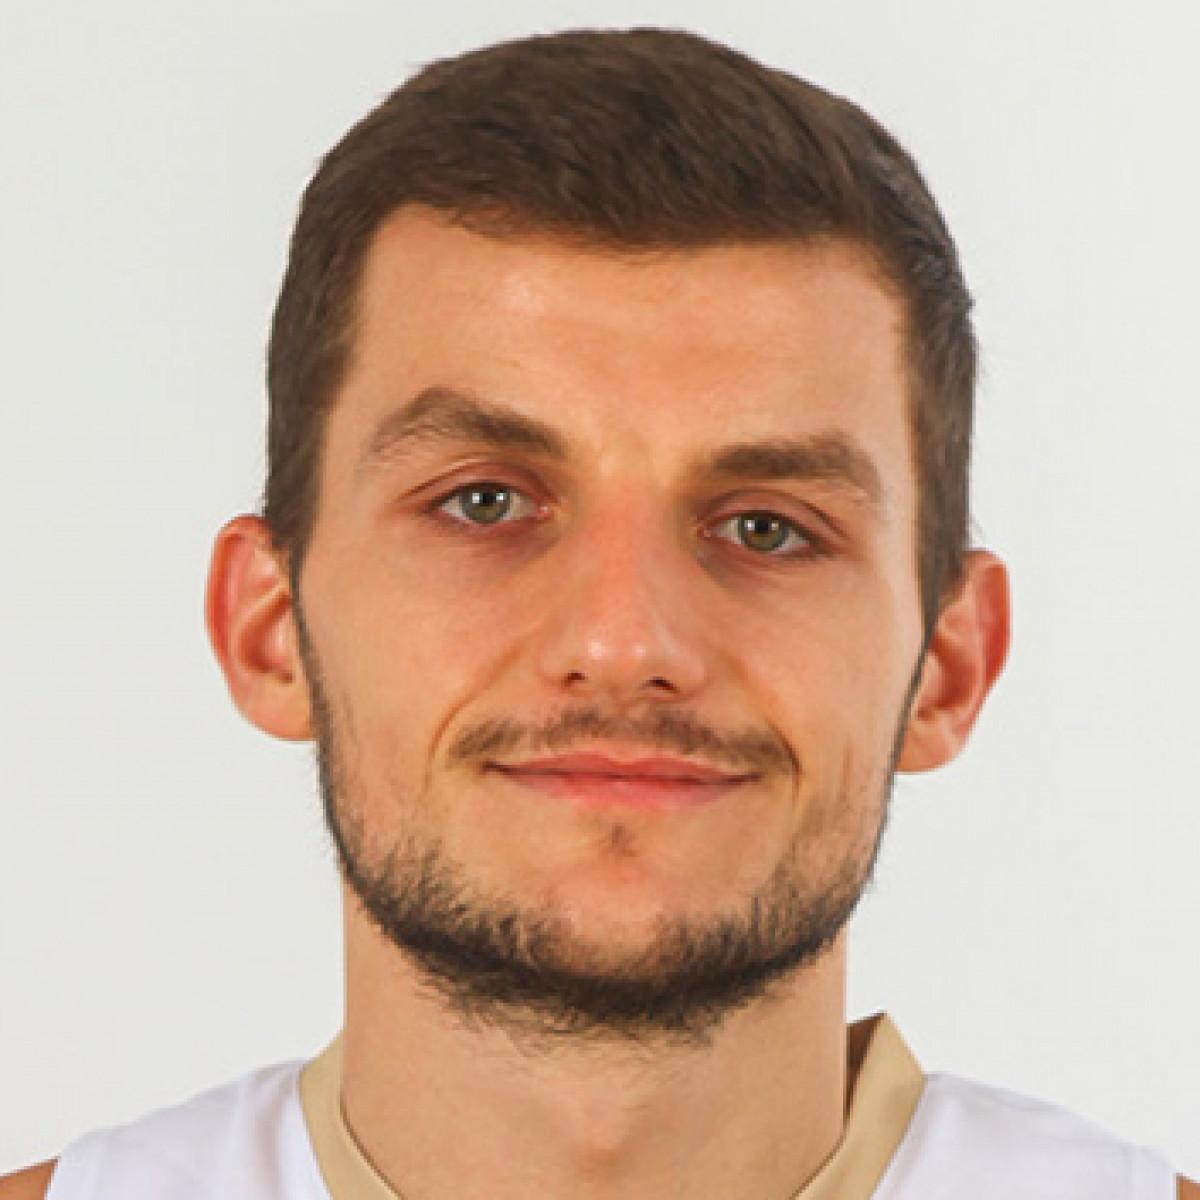 Piotr Wieloch